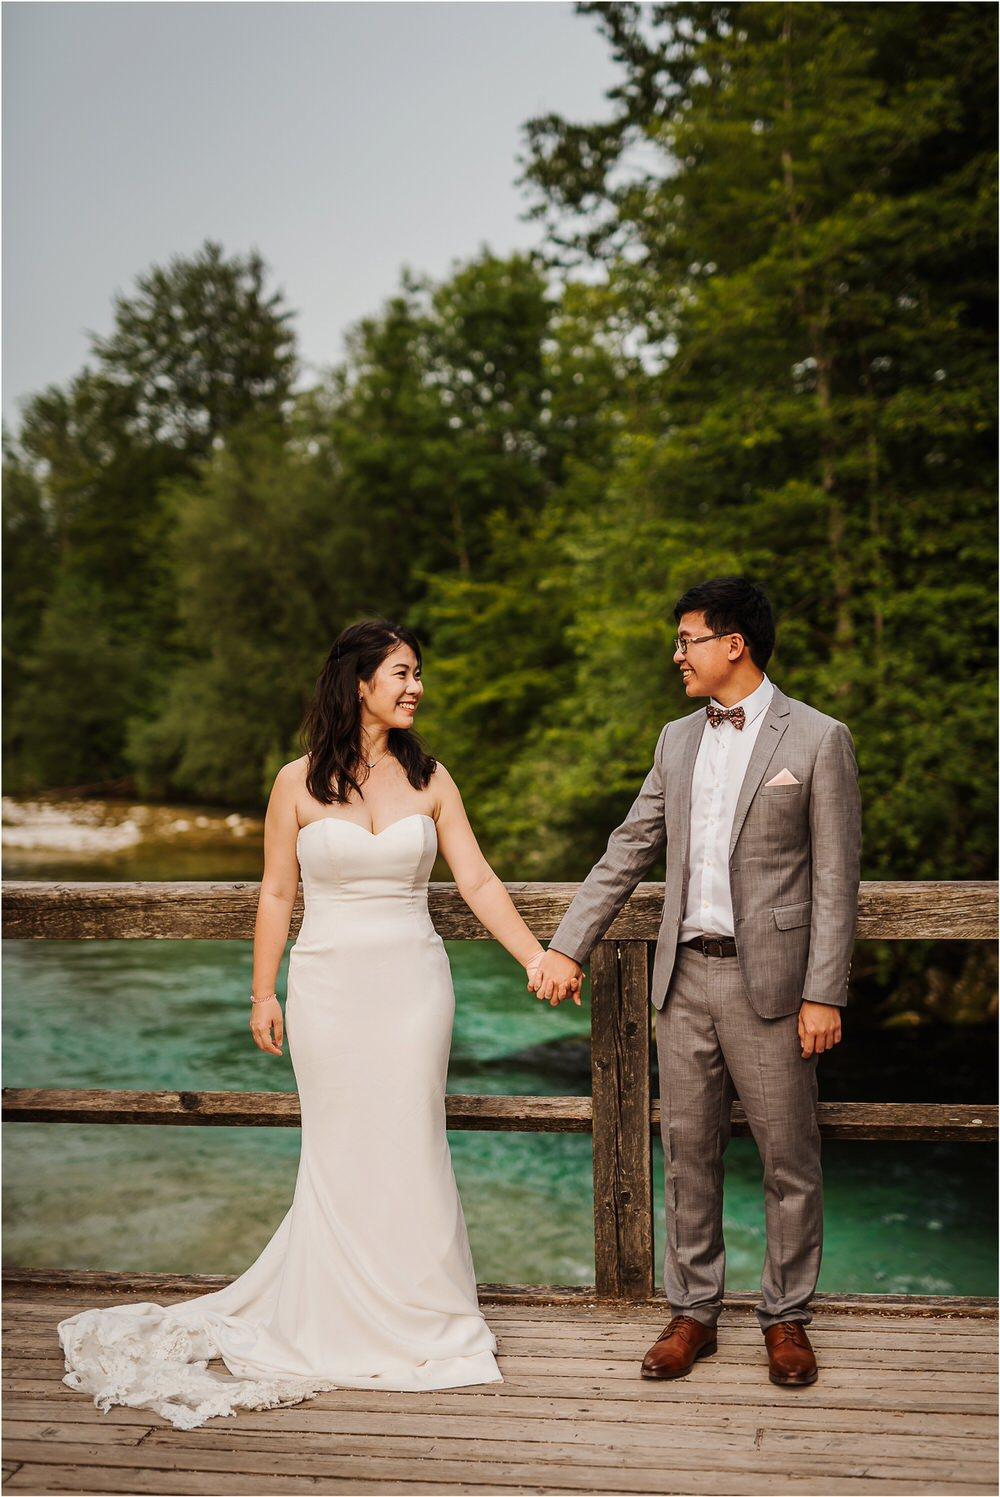 prewedding bled lake slovenia asian couple ljubljana engagement singapore love bohinj lake 0056.jpg